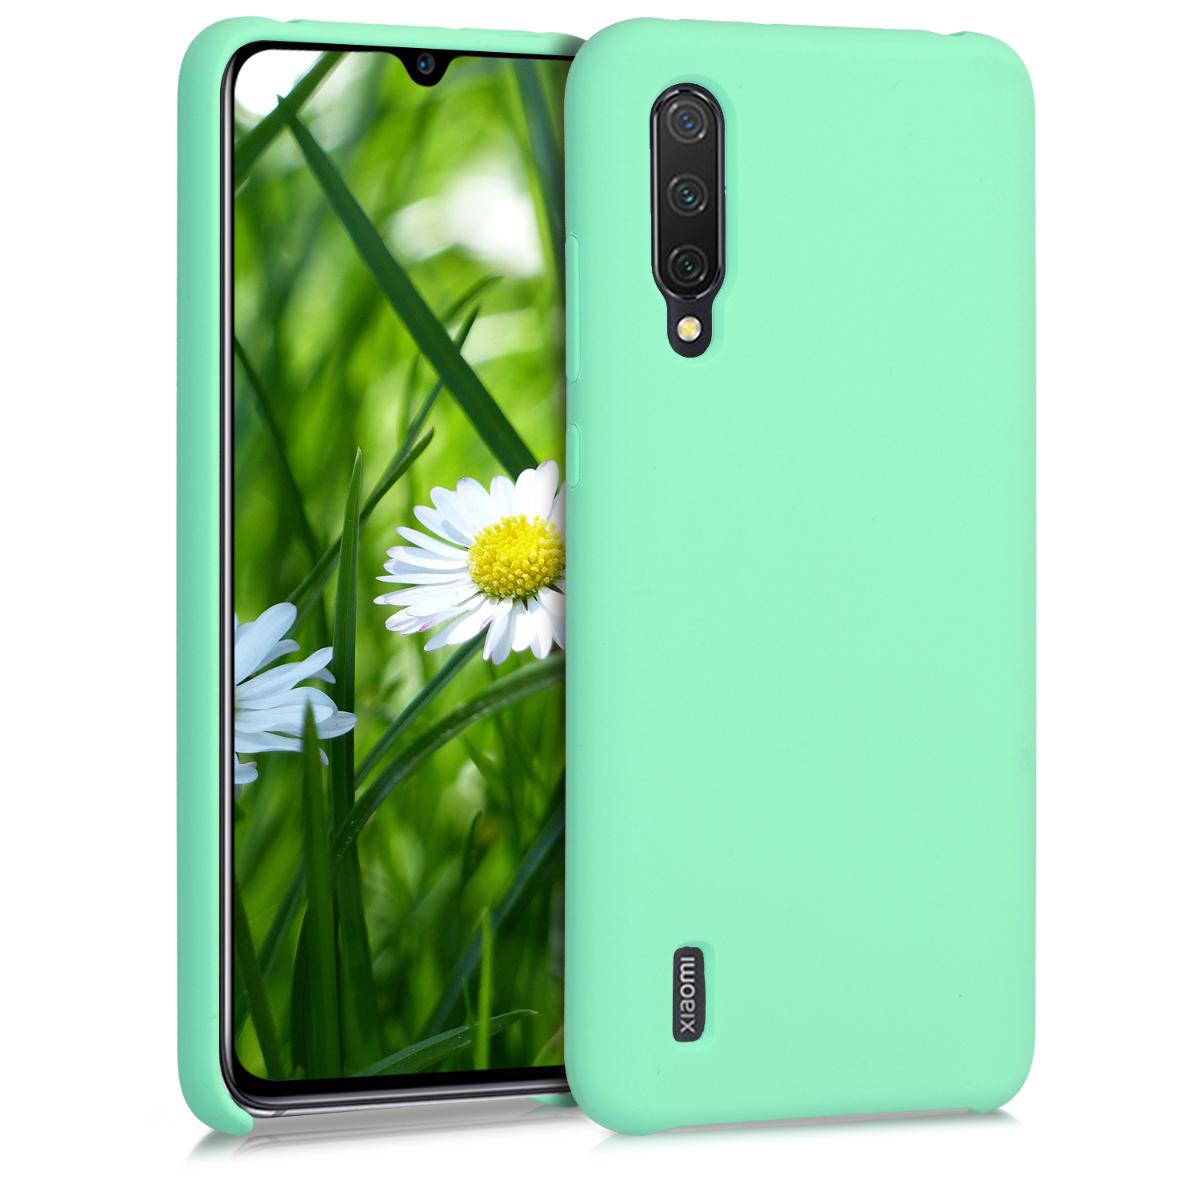 KW Θήκη Σιλικόνης Xiaomi Mi 9 Lite - Soft Flexible Rubber Protective Cover - Peppermint Green (50585.147)